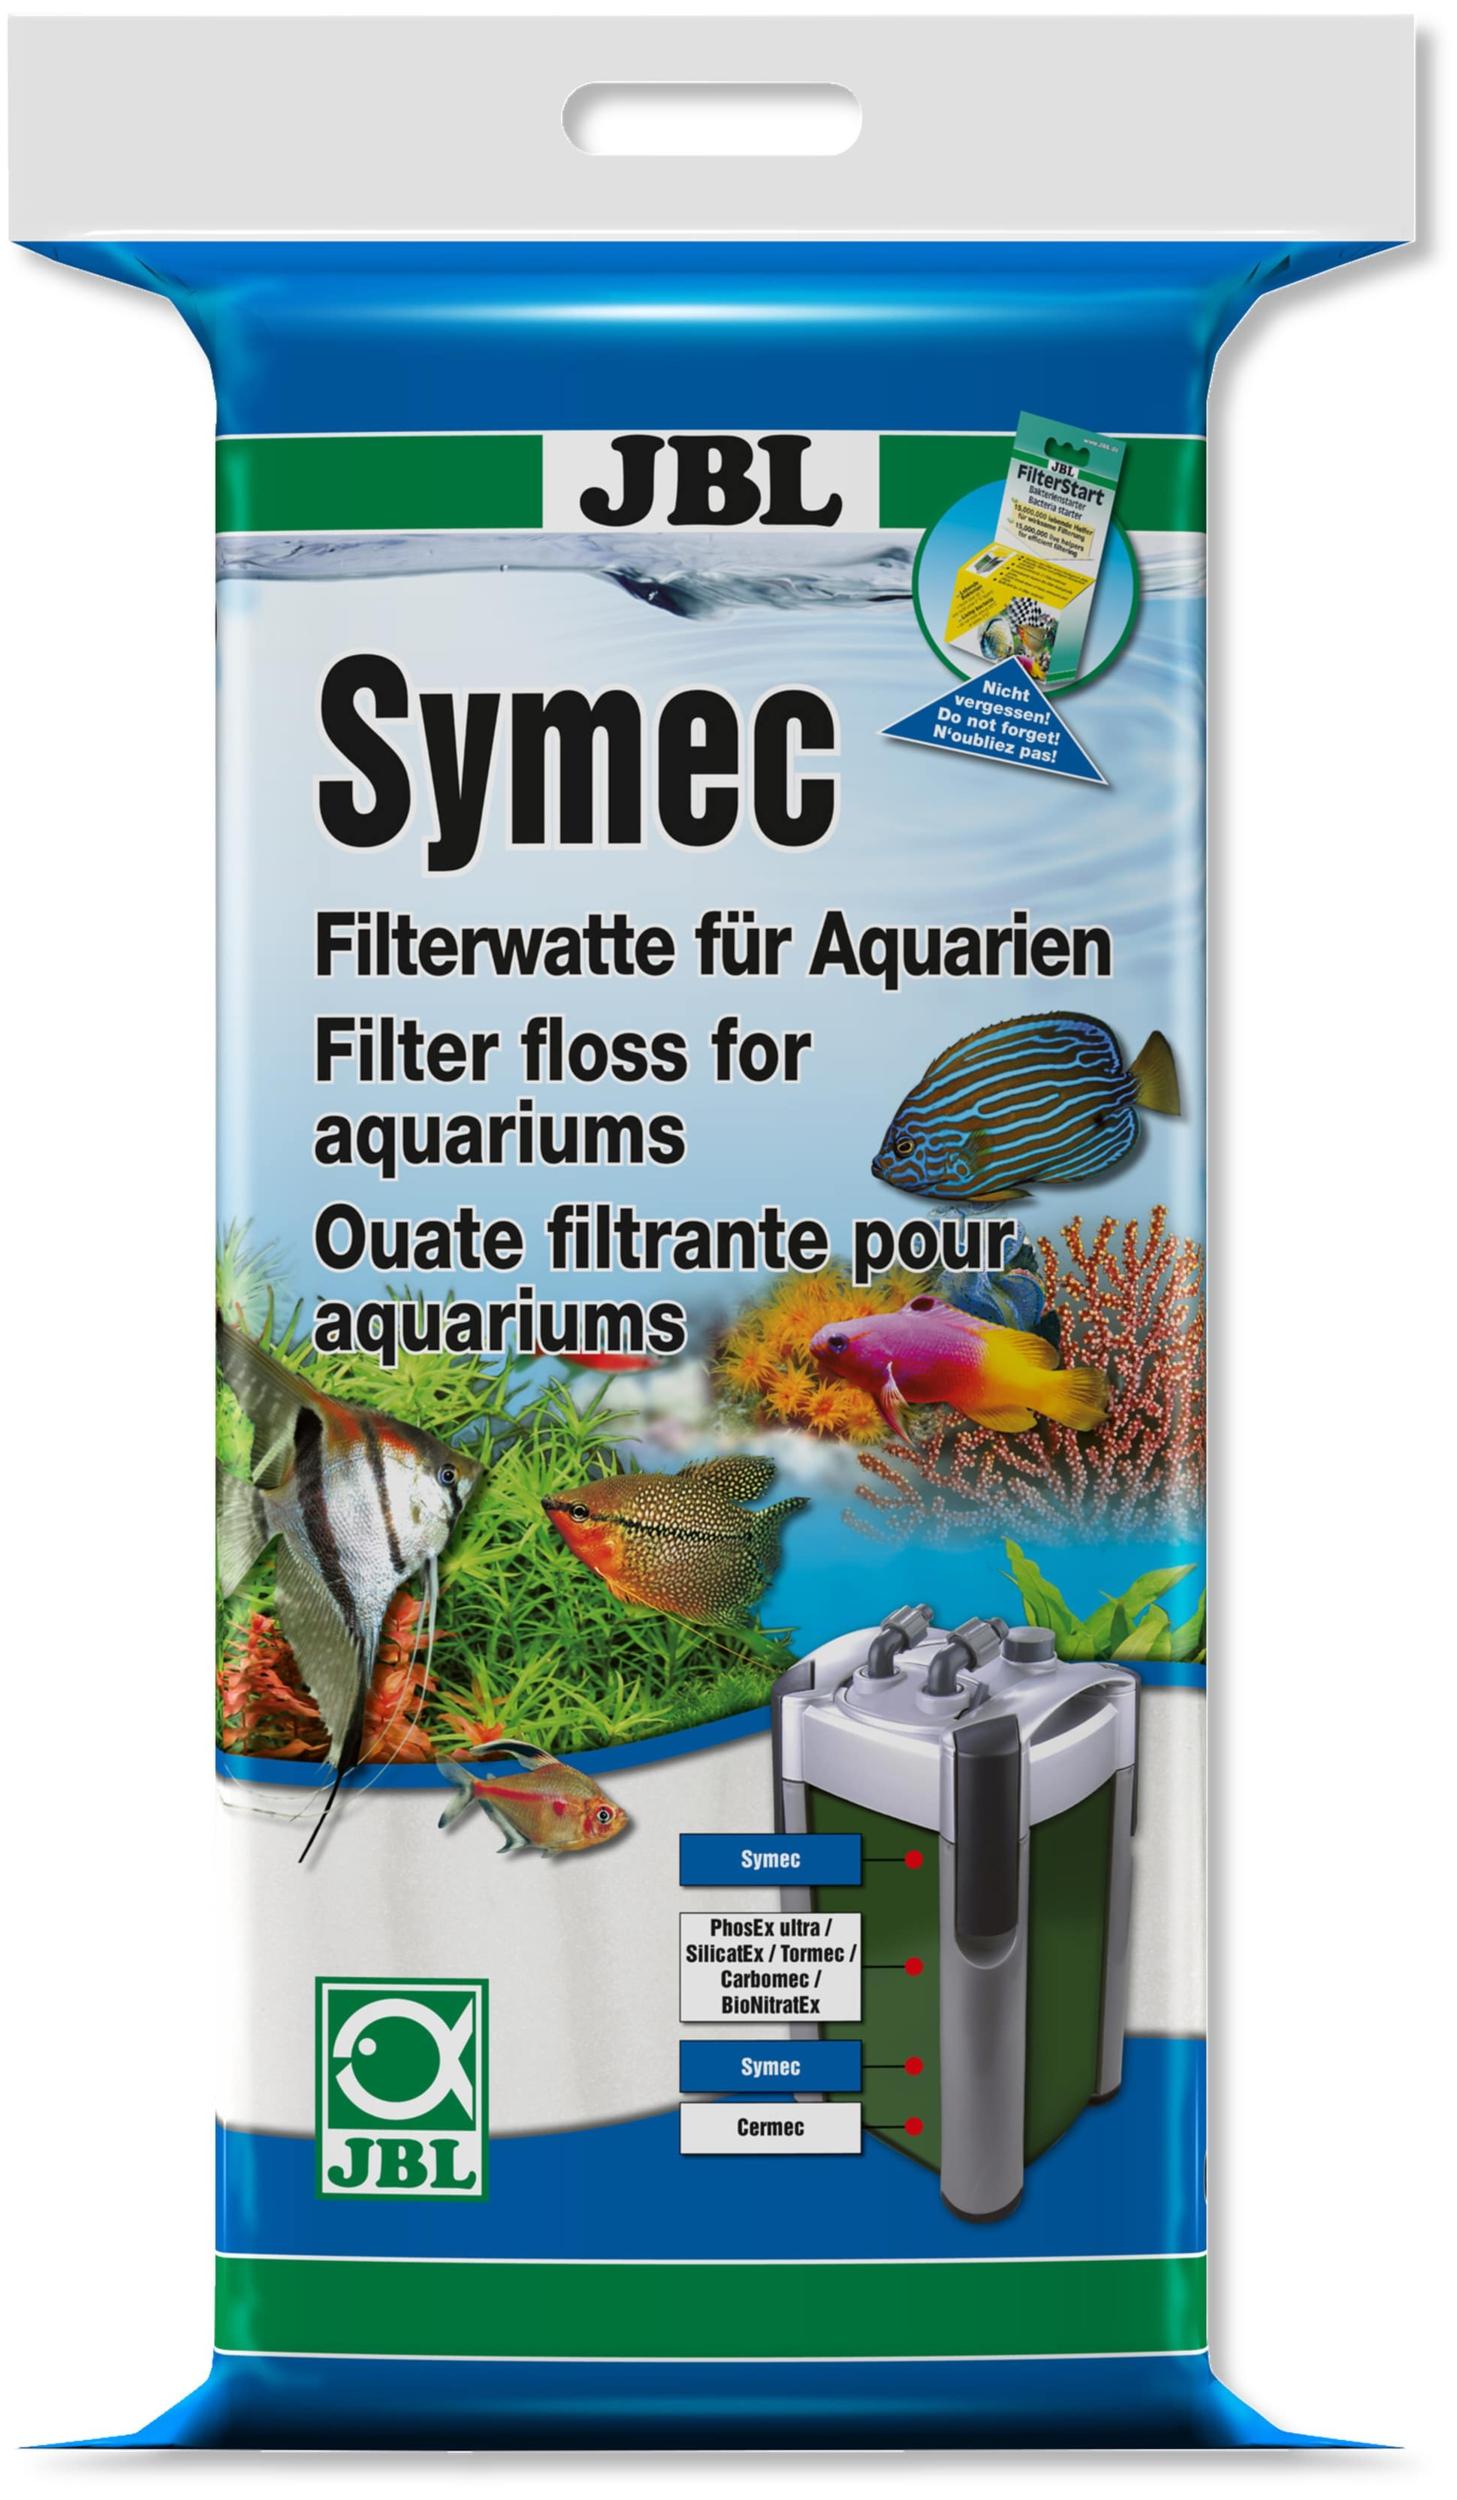 jbl-symec-1000gr-ouate-filtrante-fine-haute-qualite-min